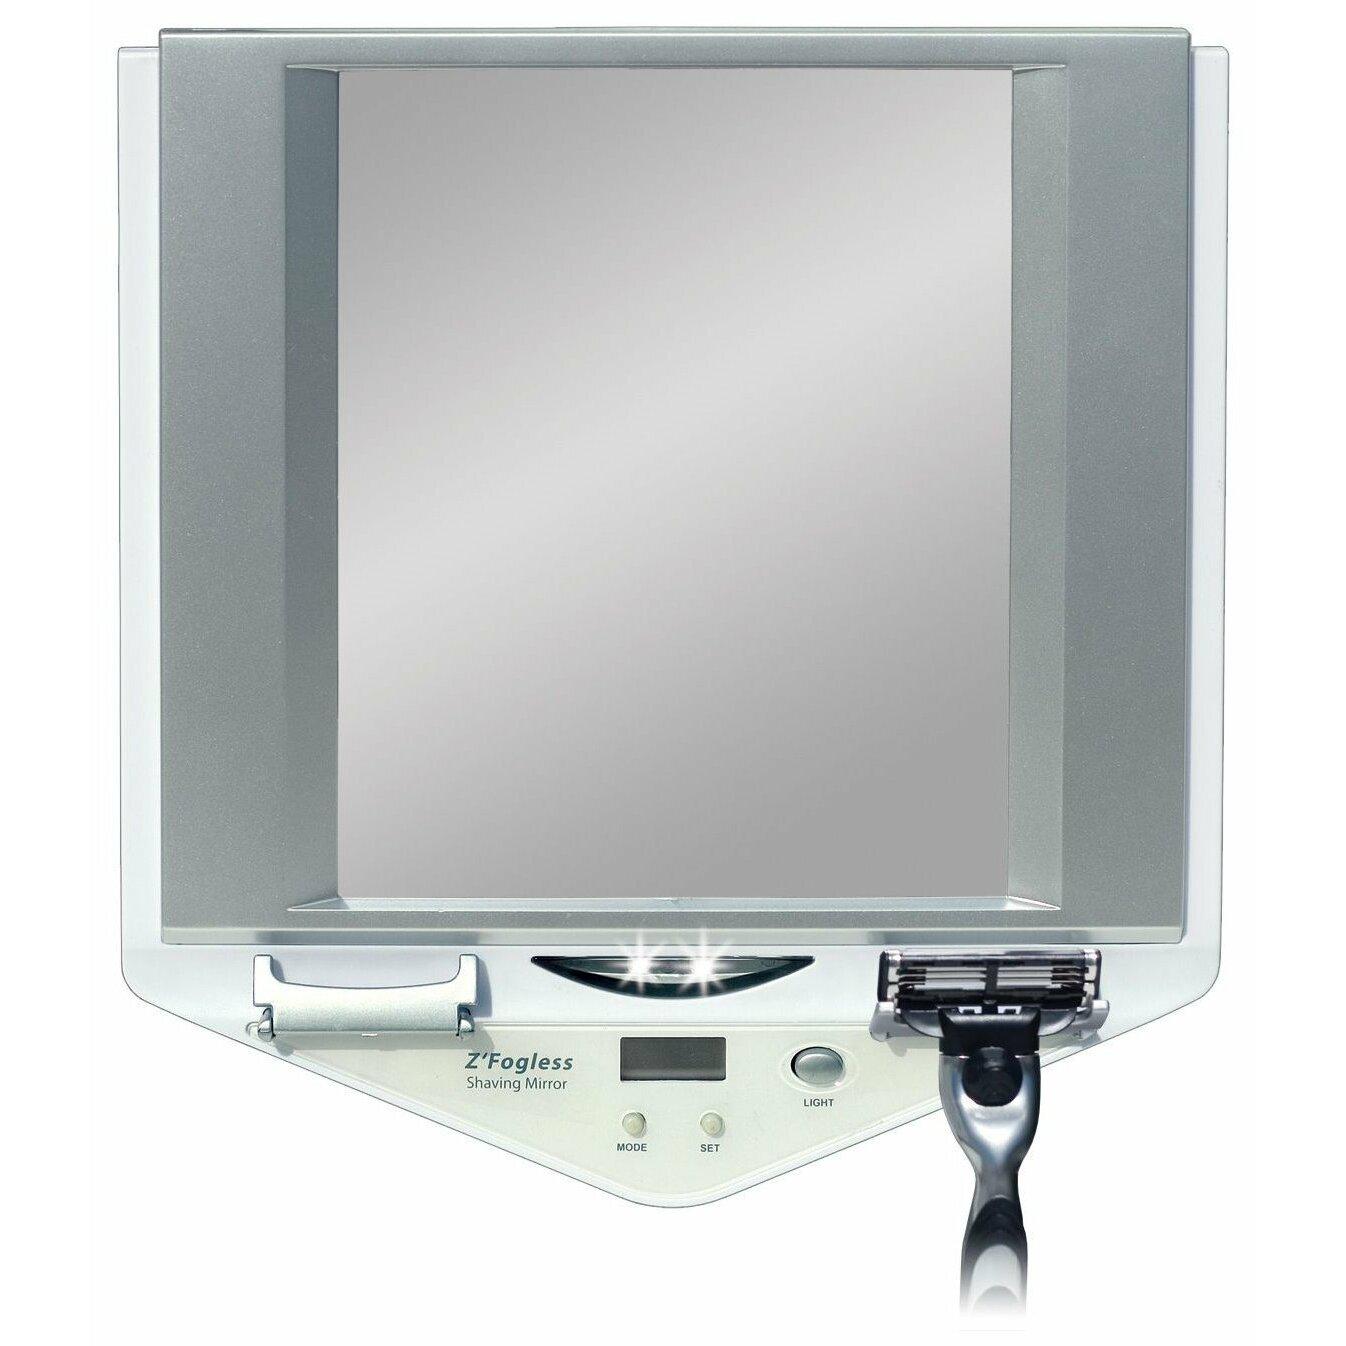 Zadro Z Fogless Lighted Shaving Mirror Amp Reviews Wayfair